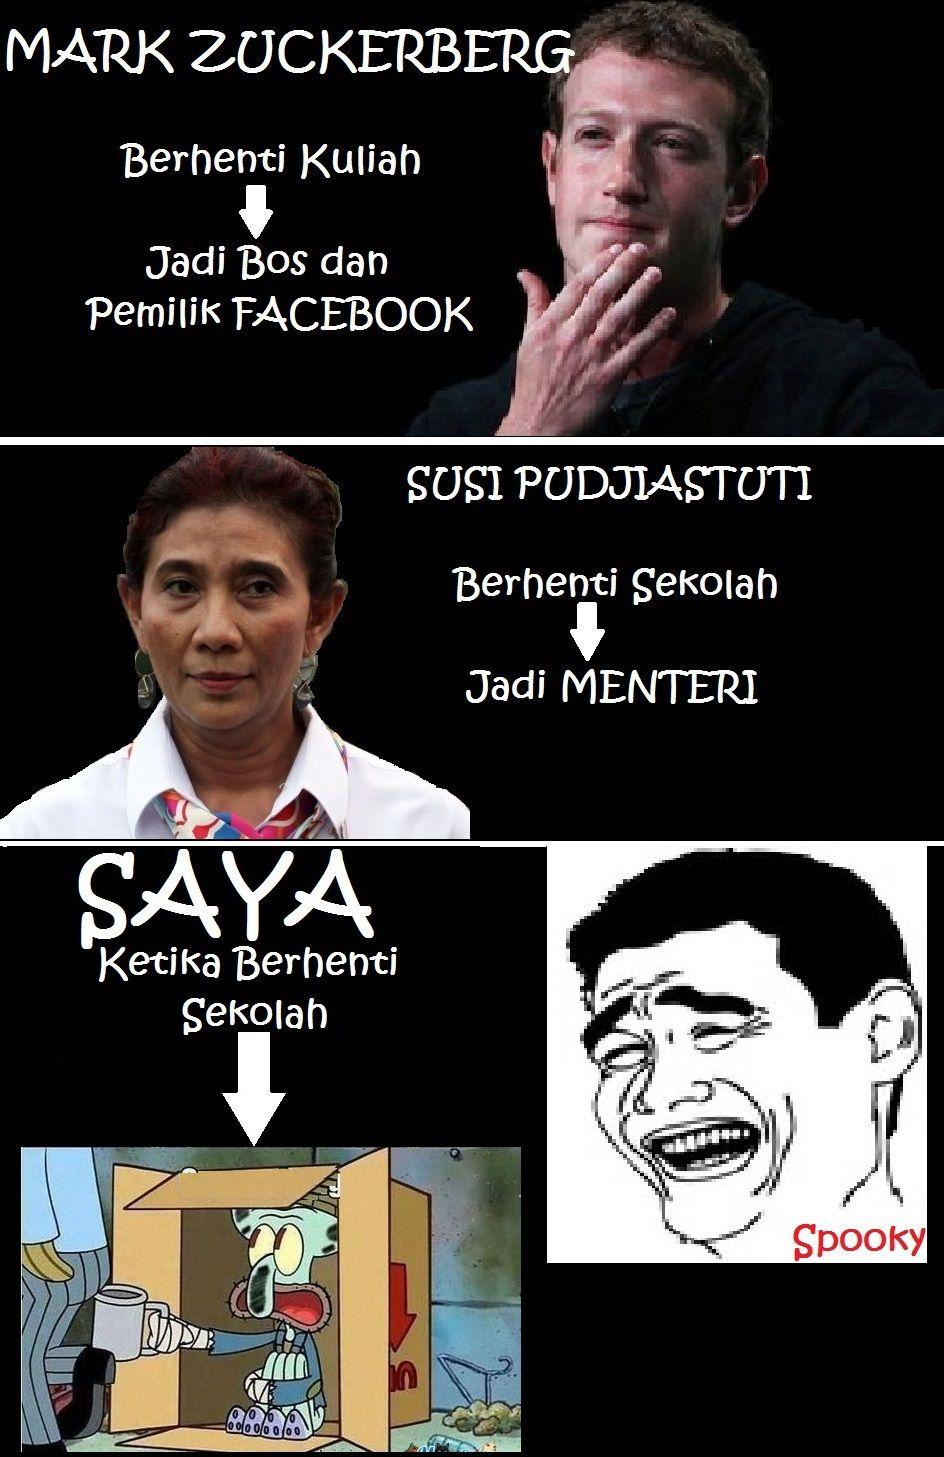 Ketika Om Maddog Bikin Status Si Mark Zuckerberg Pun Tunduk